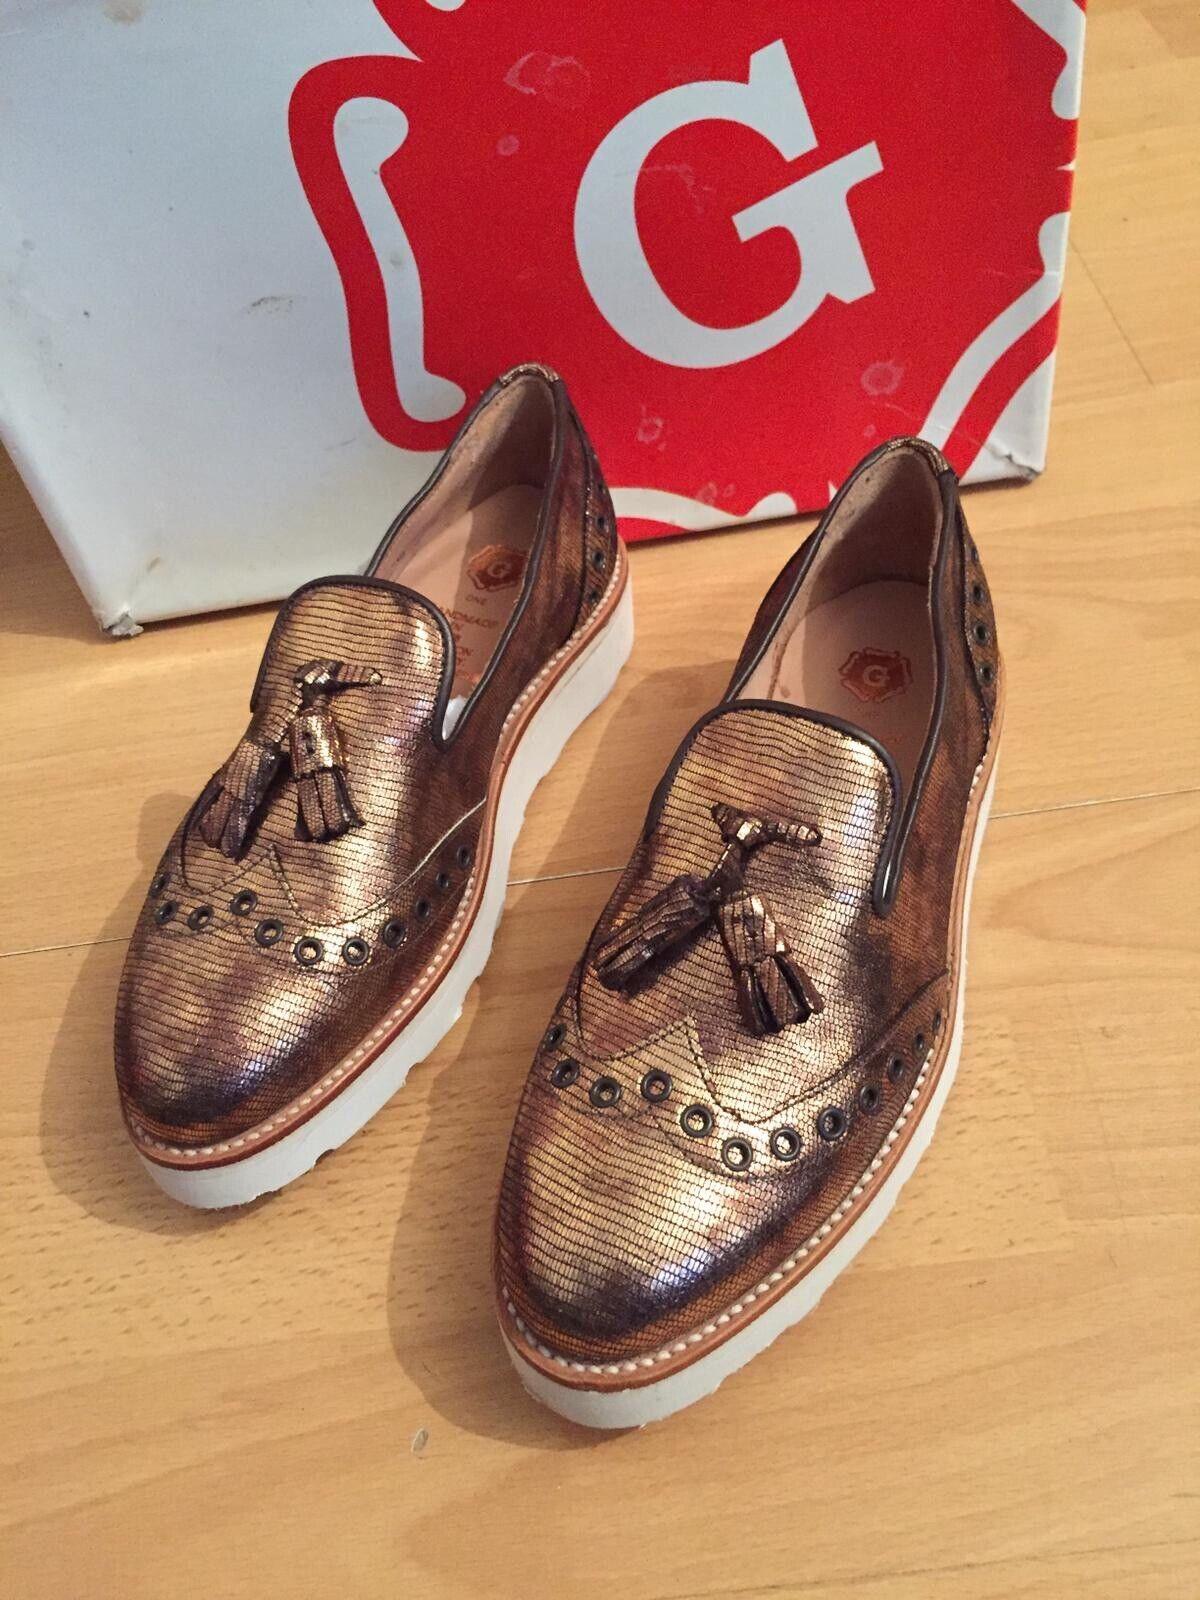 Grenson G One  damen Leather Tassel Loafer, Uk 5, Made In England